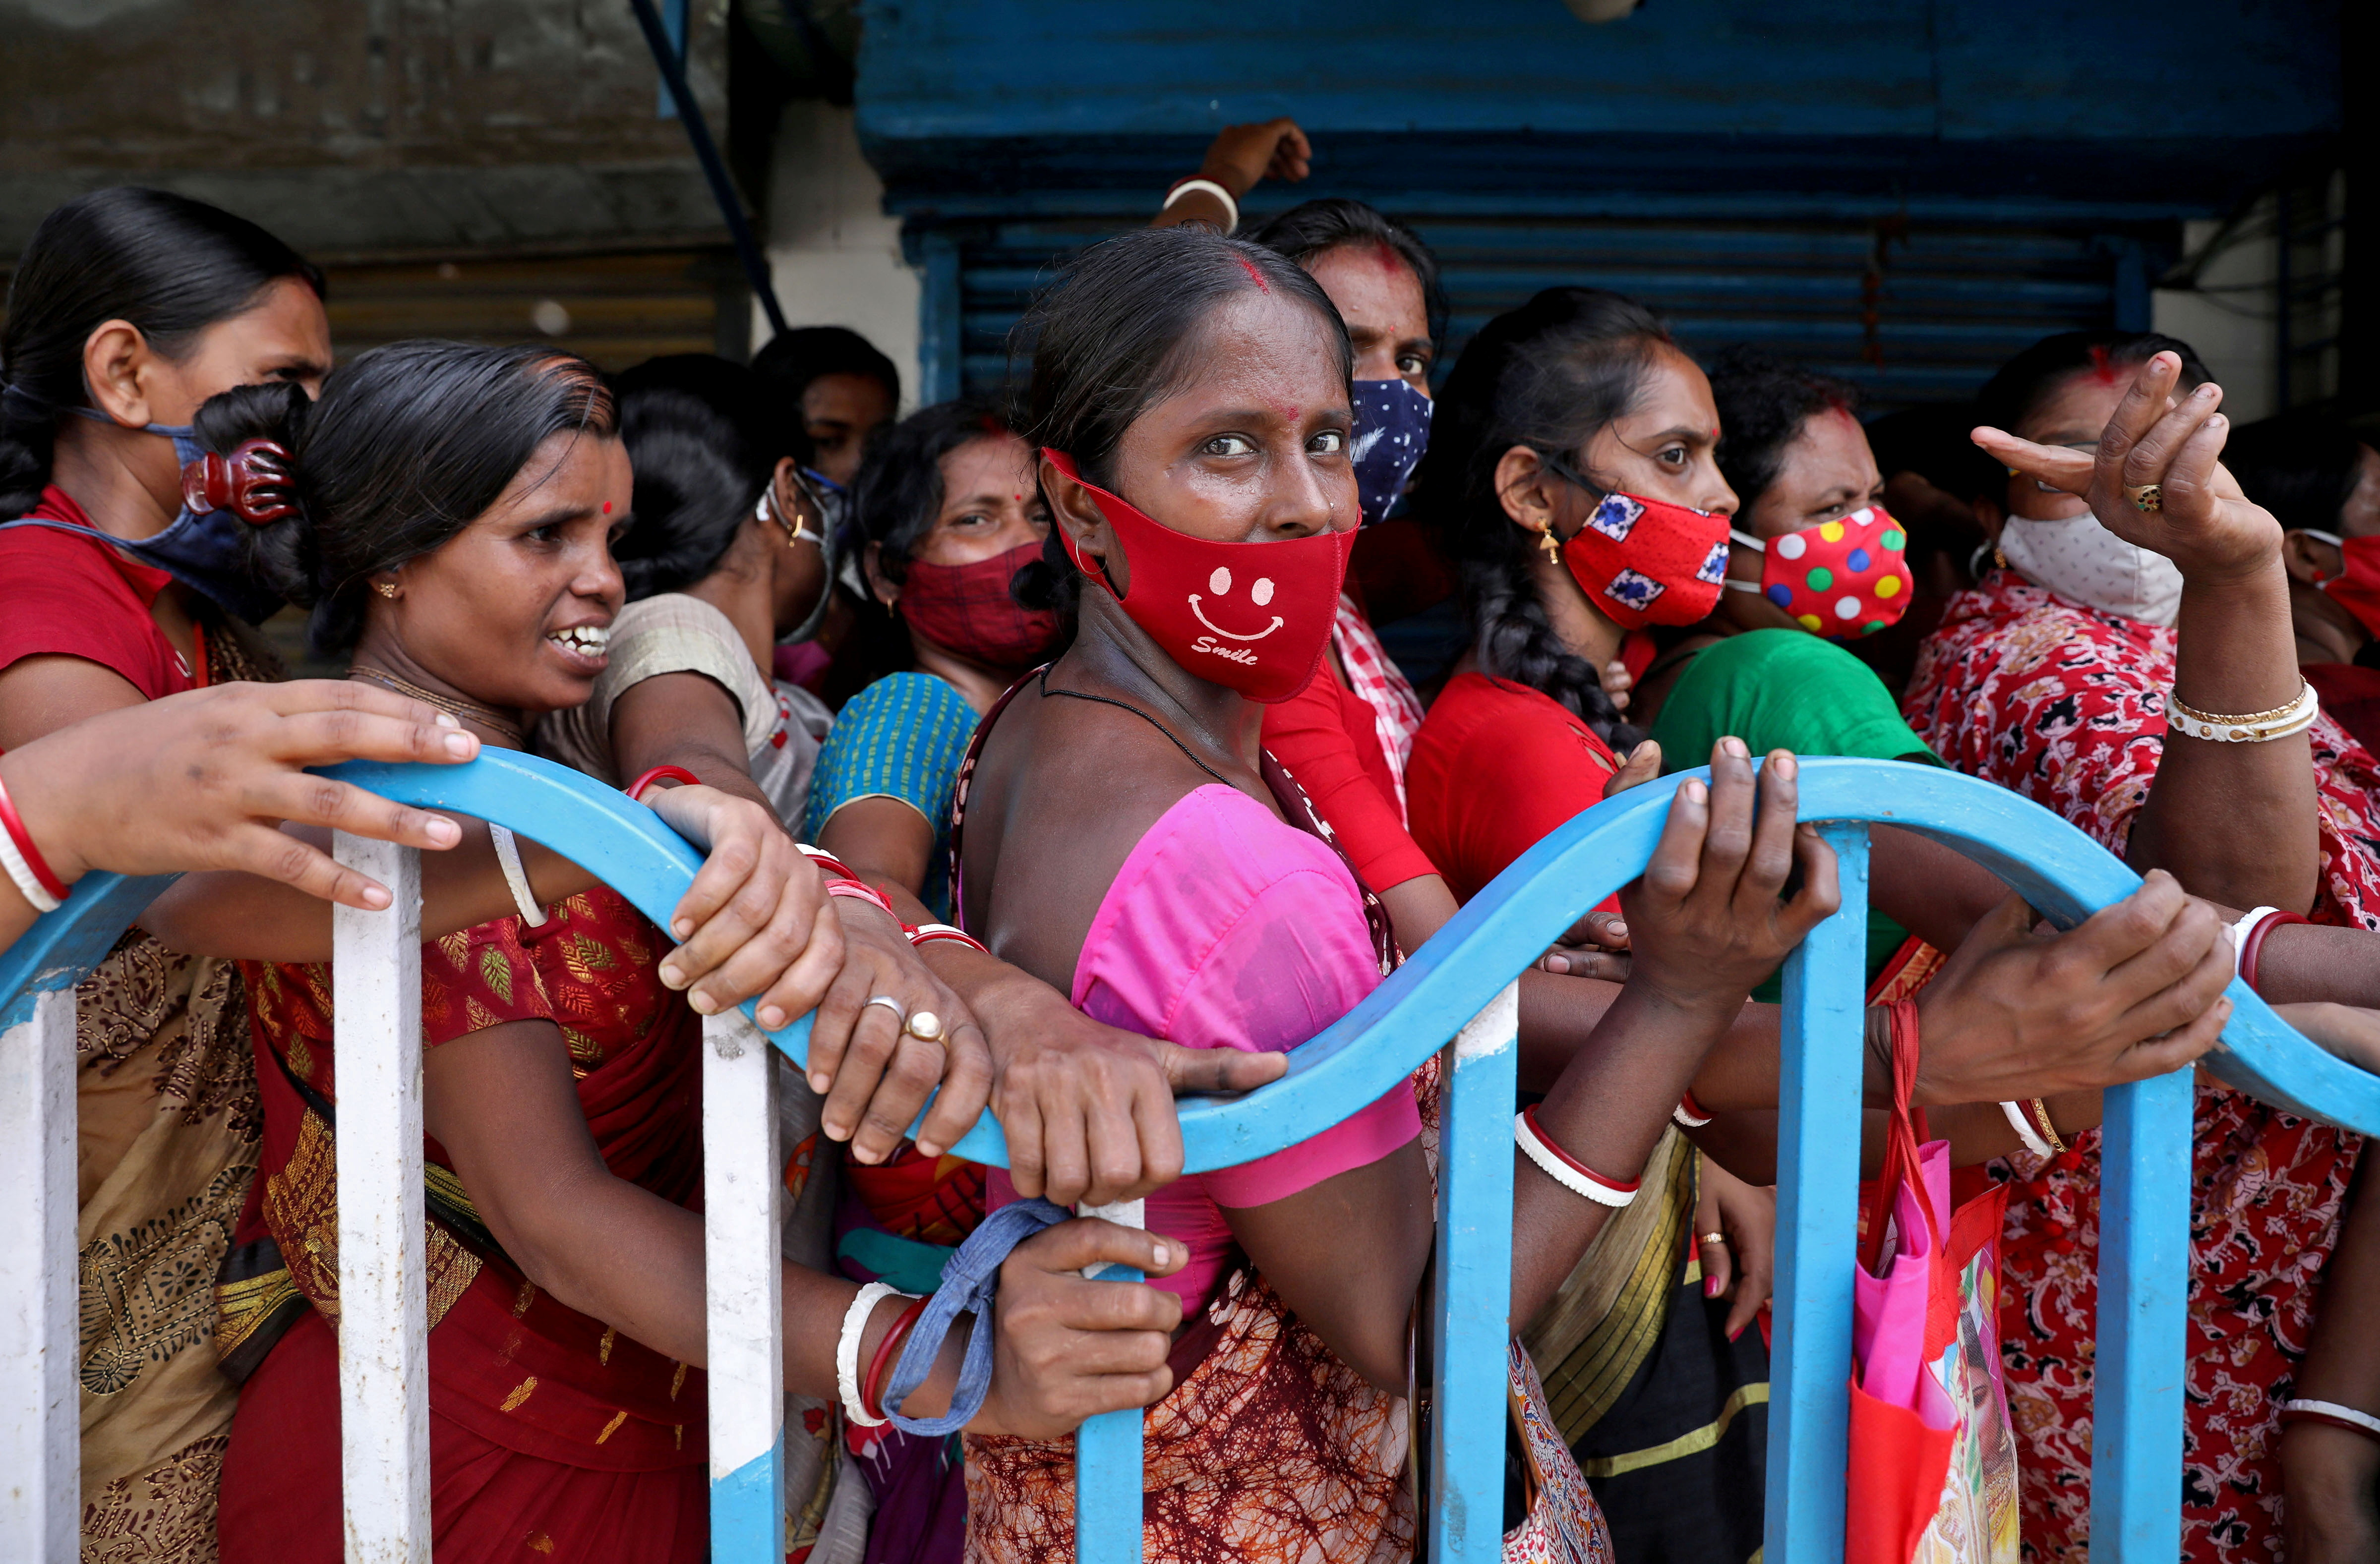 Women wait to receive a dose of COVISHIELD vaccine, a coronavirus disease (COVID-19) vaccine manufactured by Serum Institute of India, outside a vaccination centre in Kolkata, India, August 31, 2021. REUTERS/Rupak De Chowdhuri